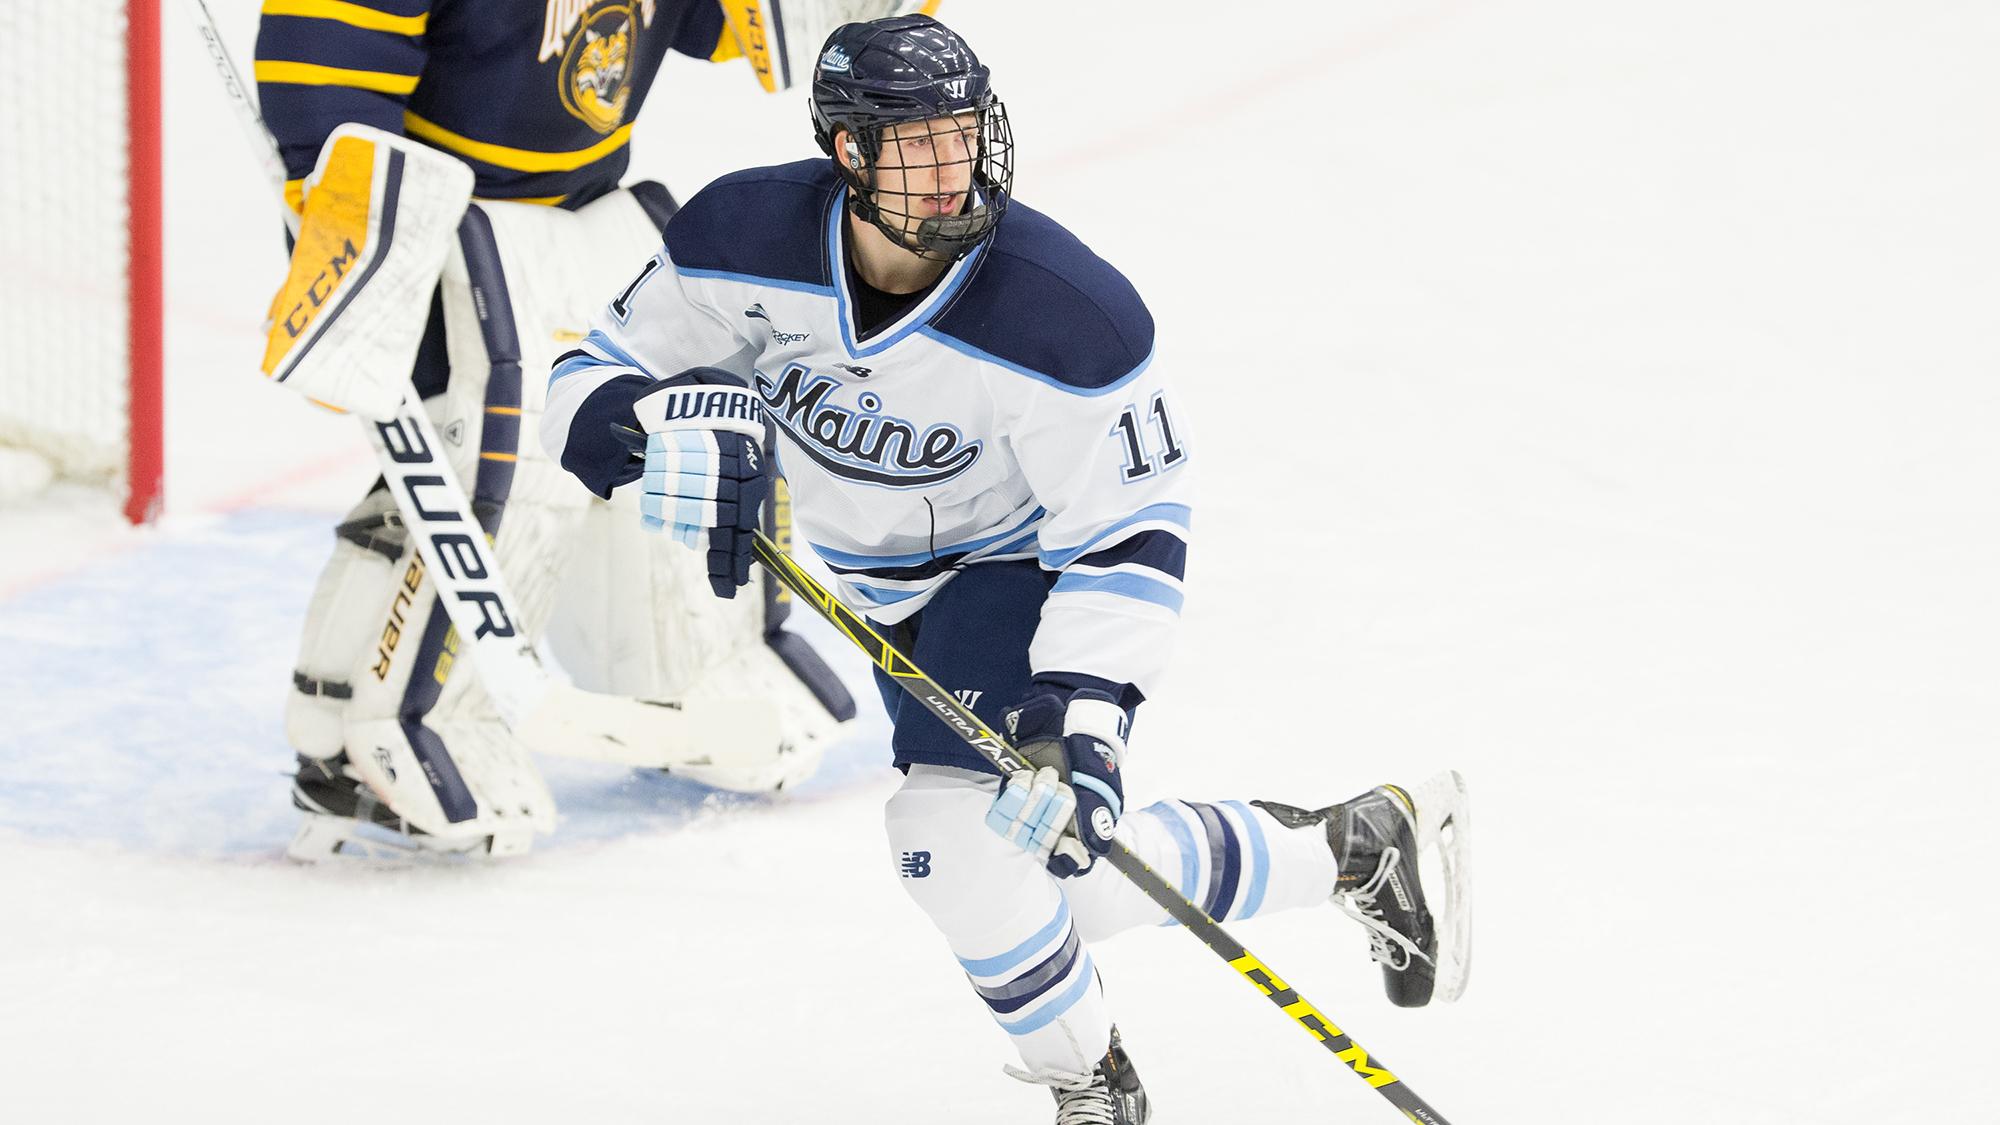 sale retailer 94a45 7a831 Hockey East Quarterfinals- Maine Black Bears – The ...